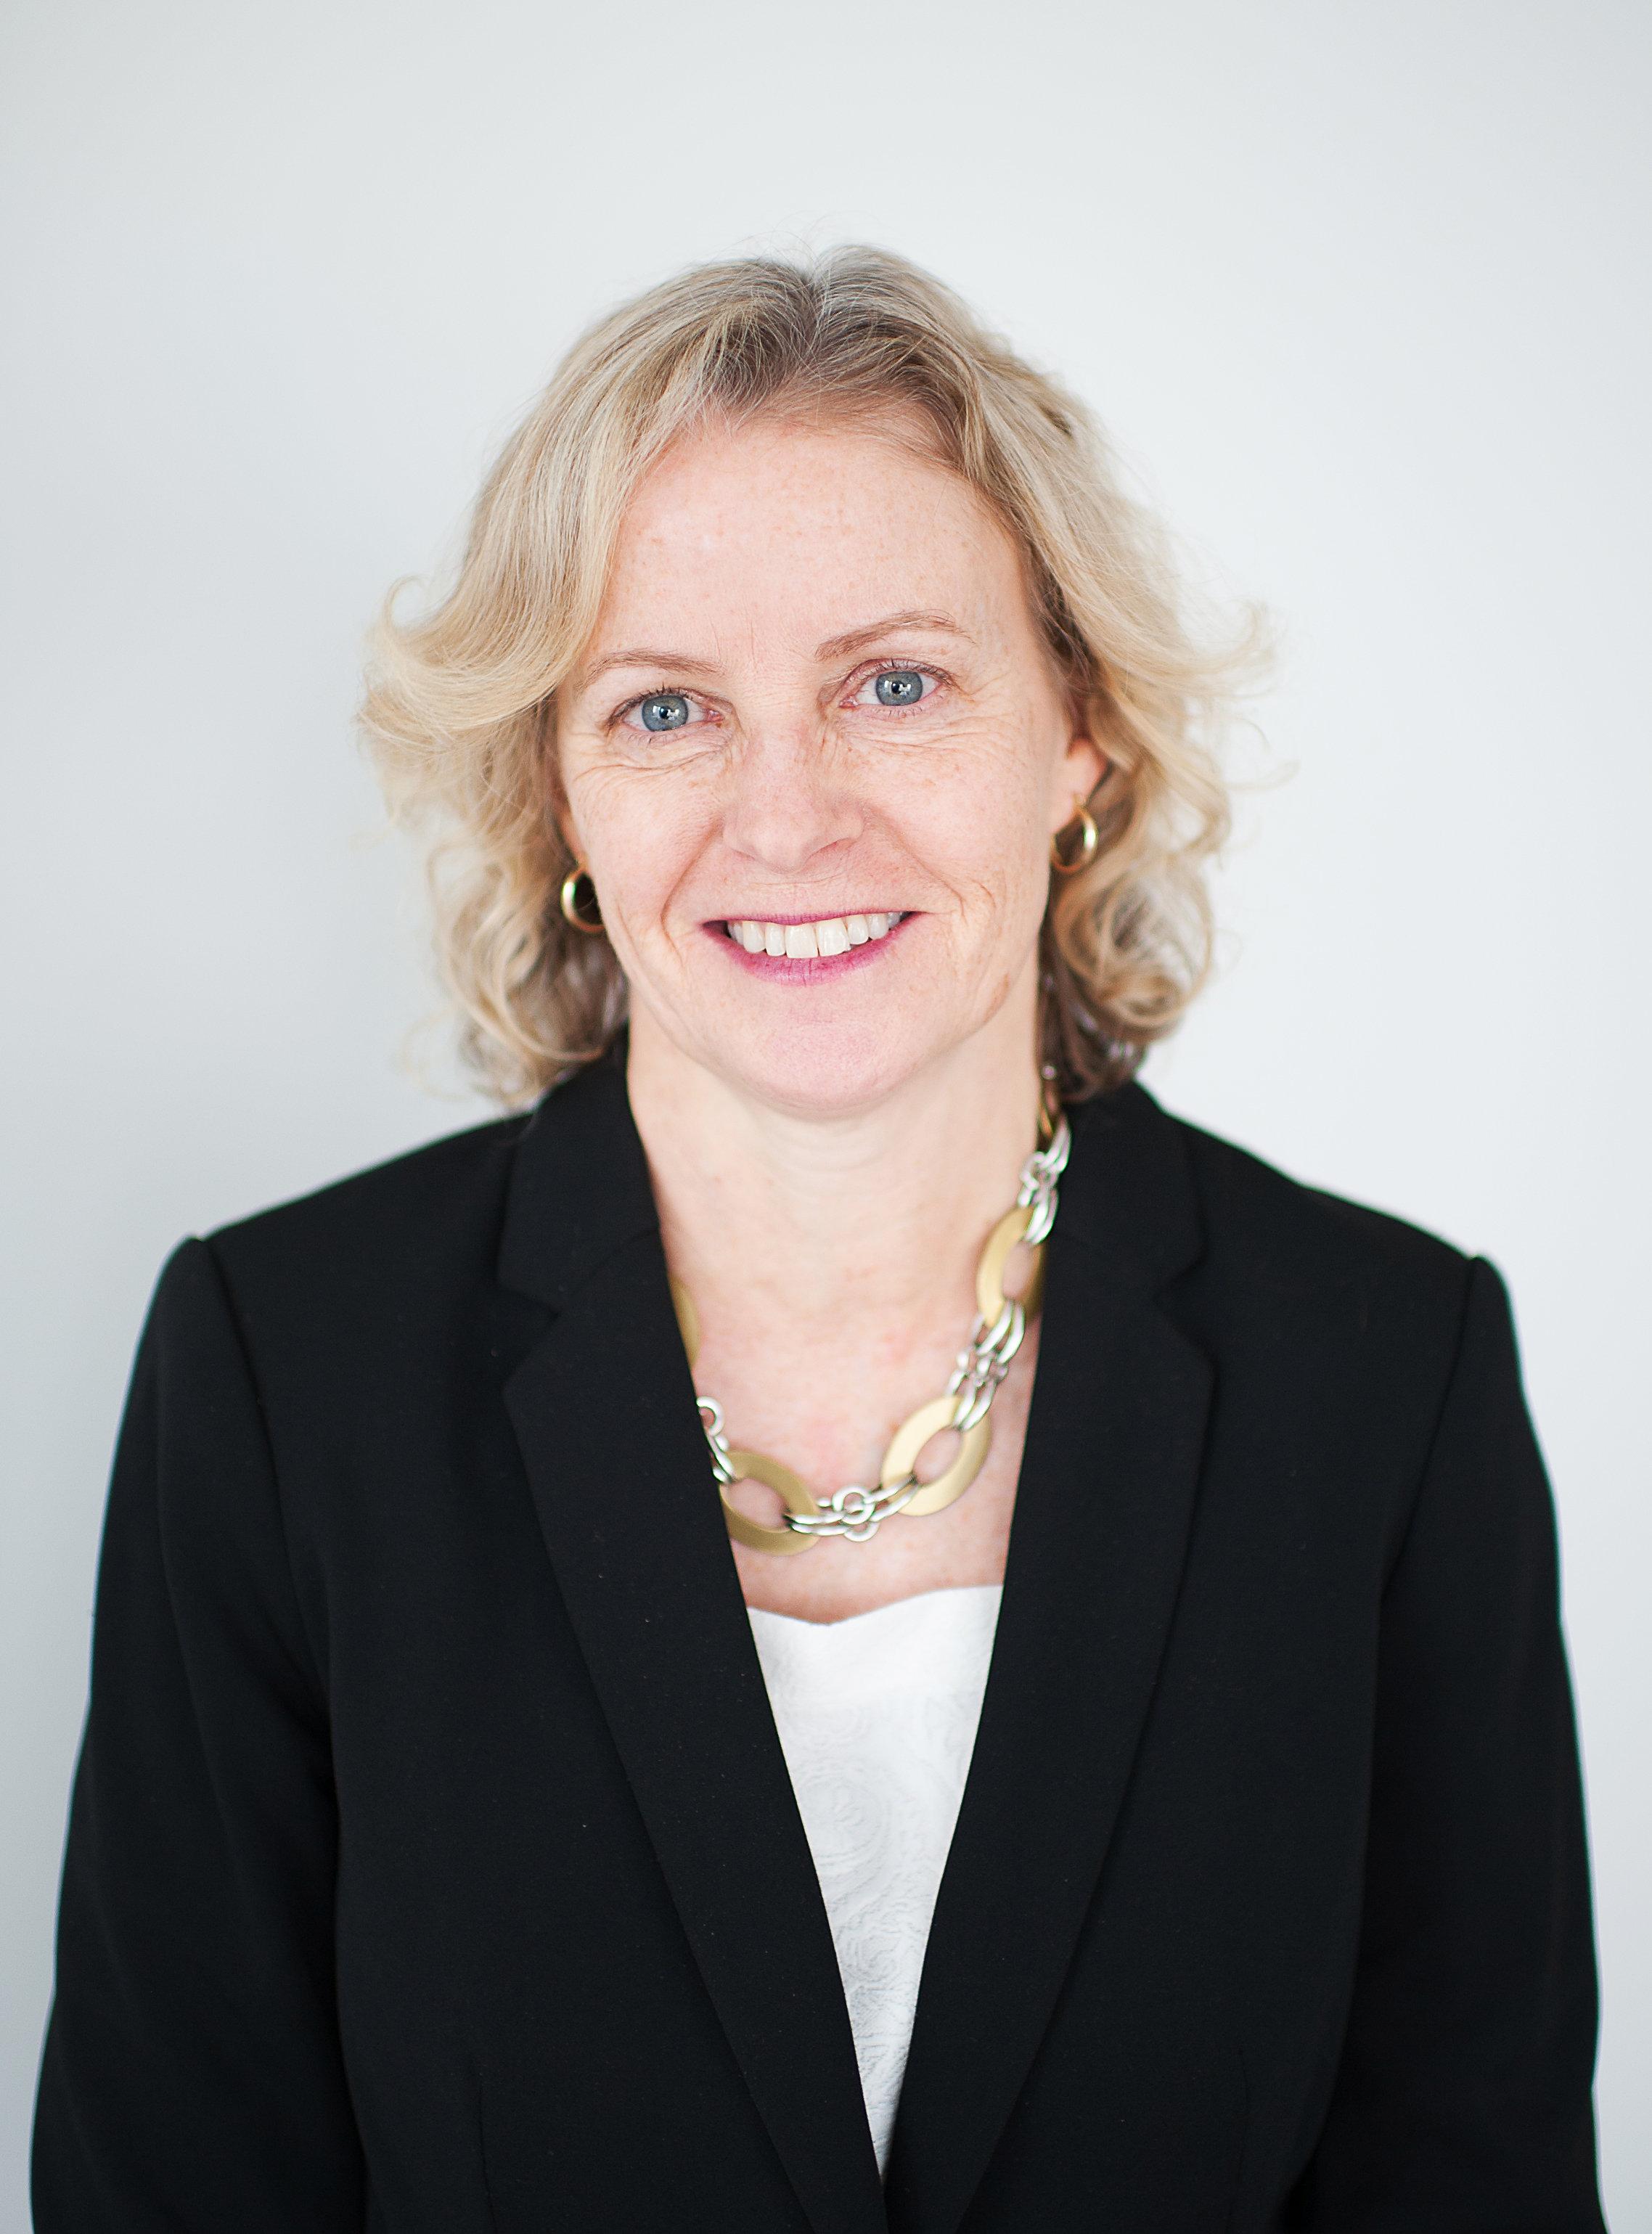 Anne Durkin, CFA